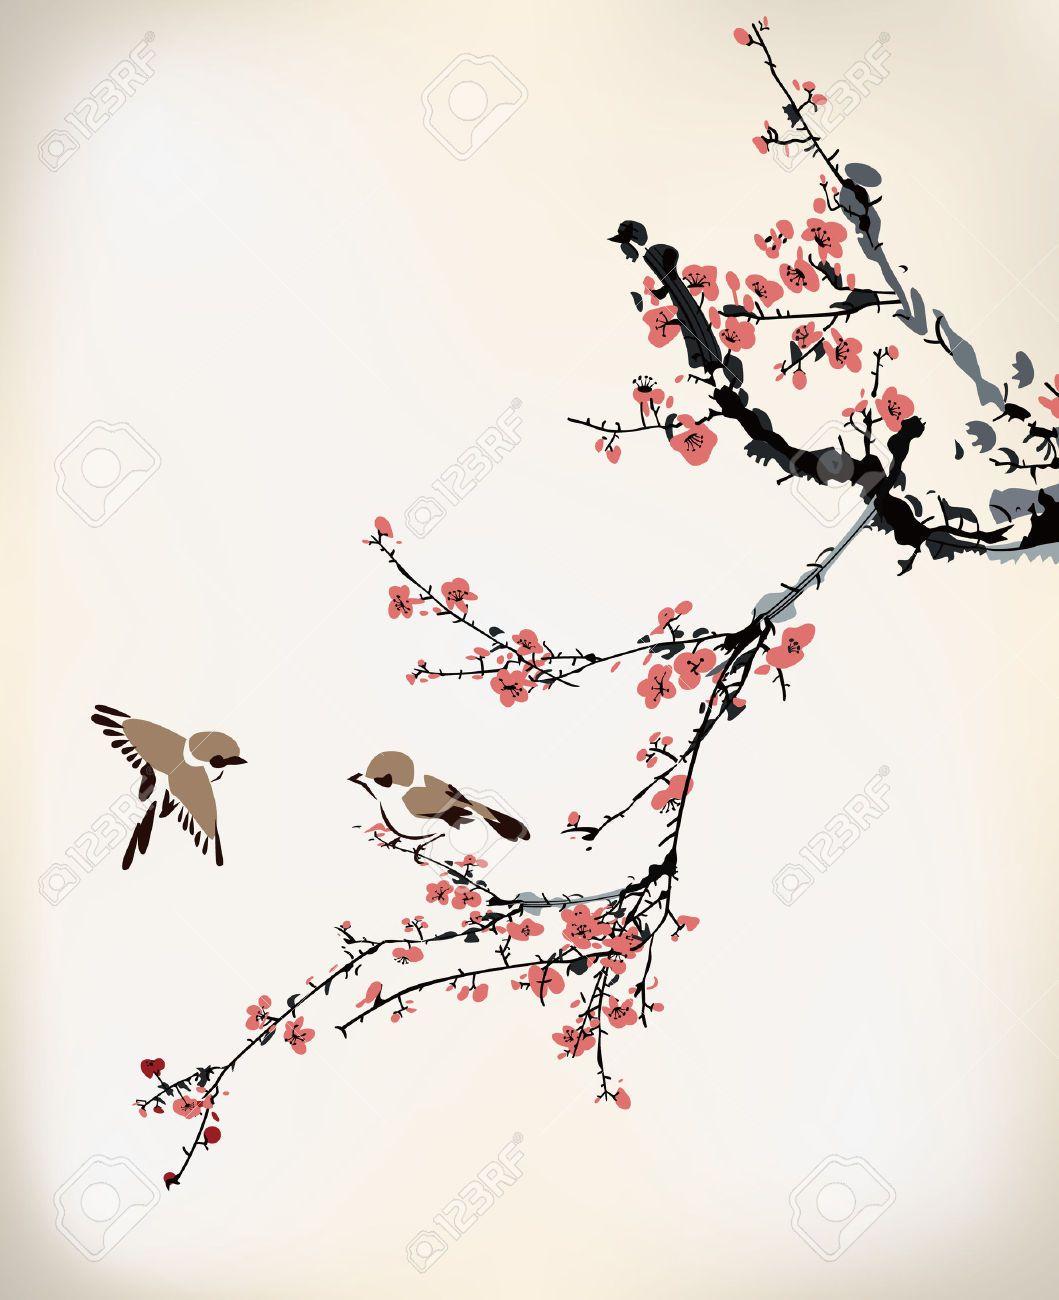 cherry blossom painting - Google Search | Plum blossom ...